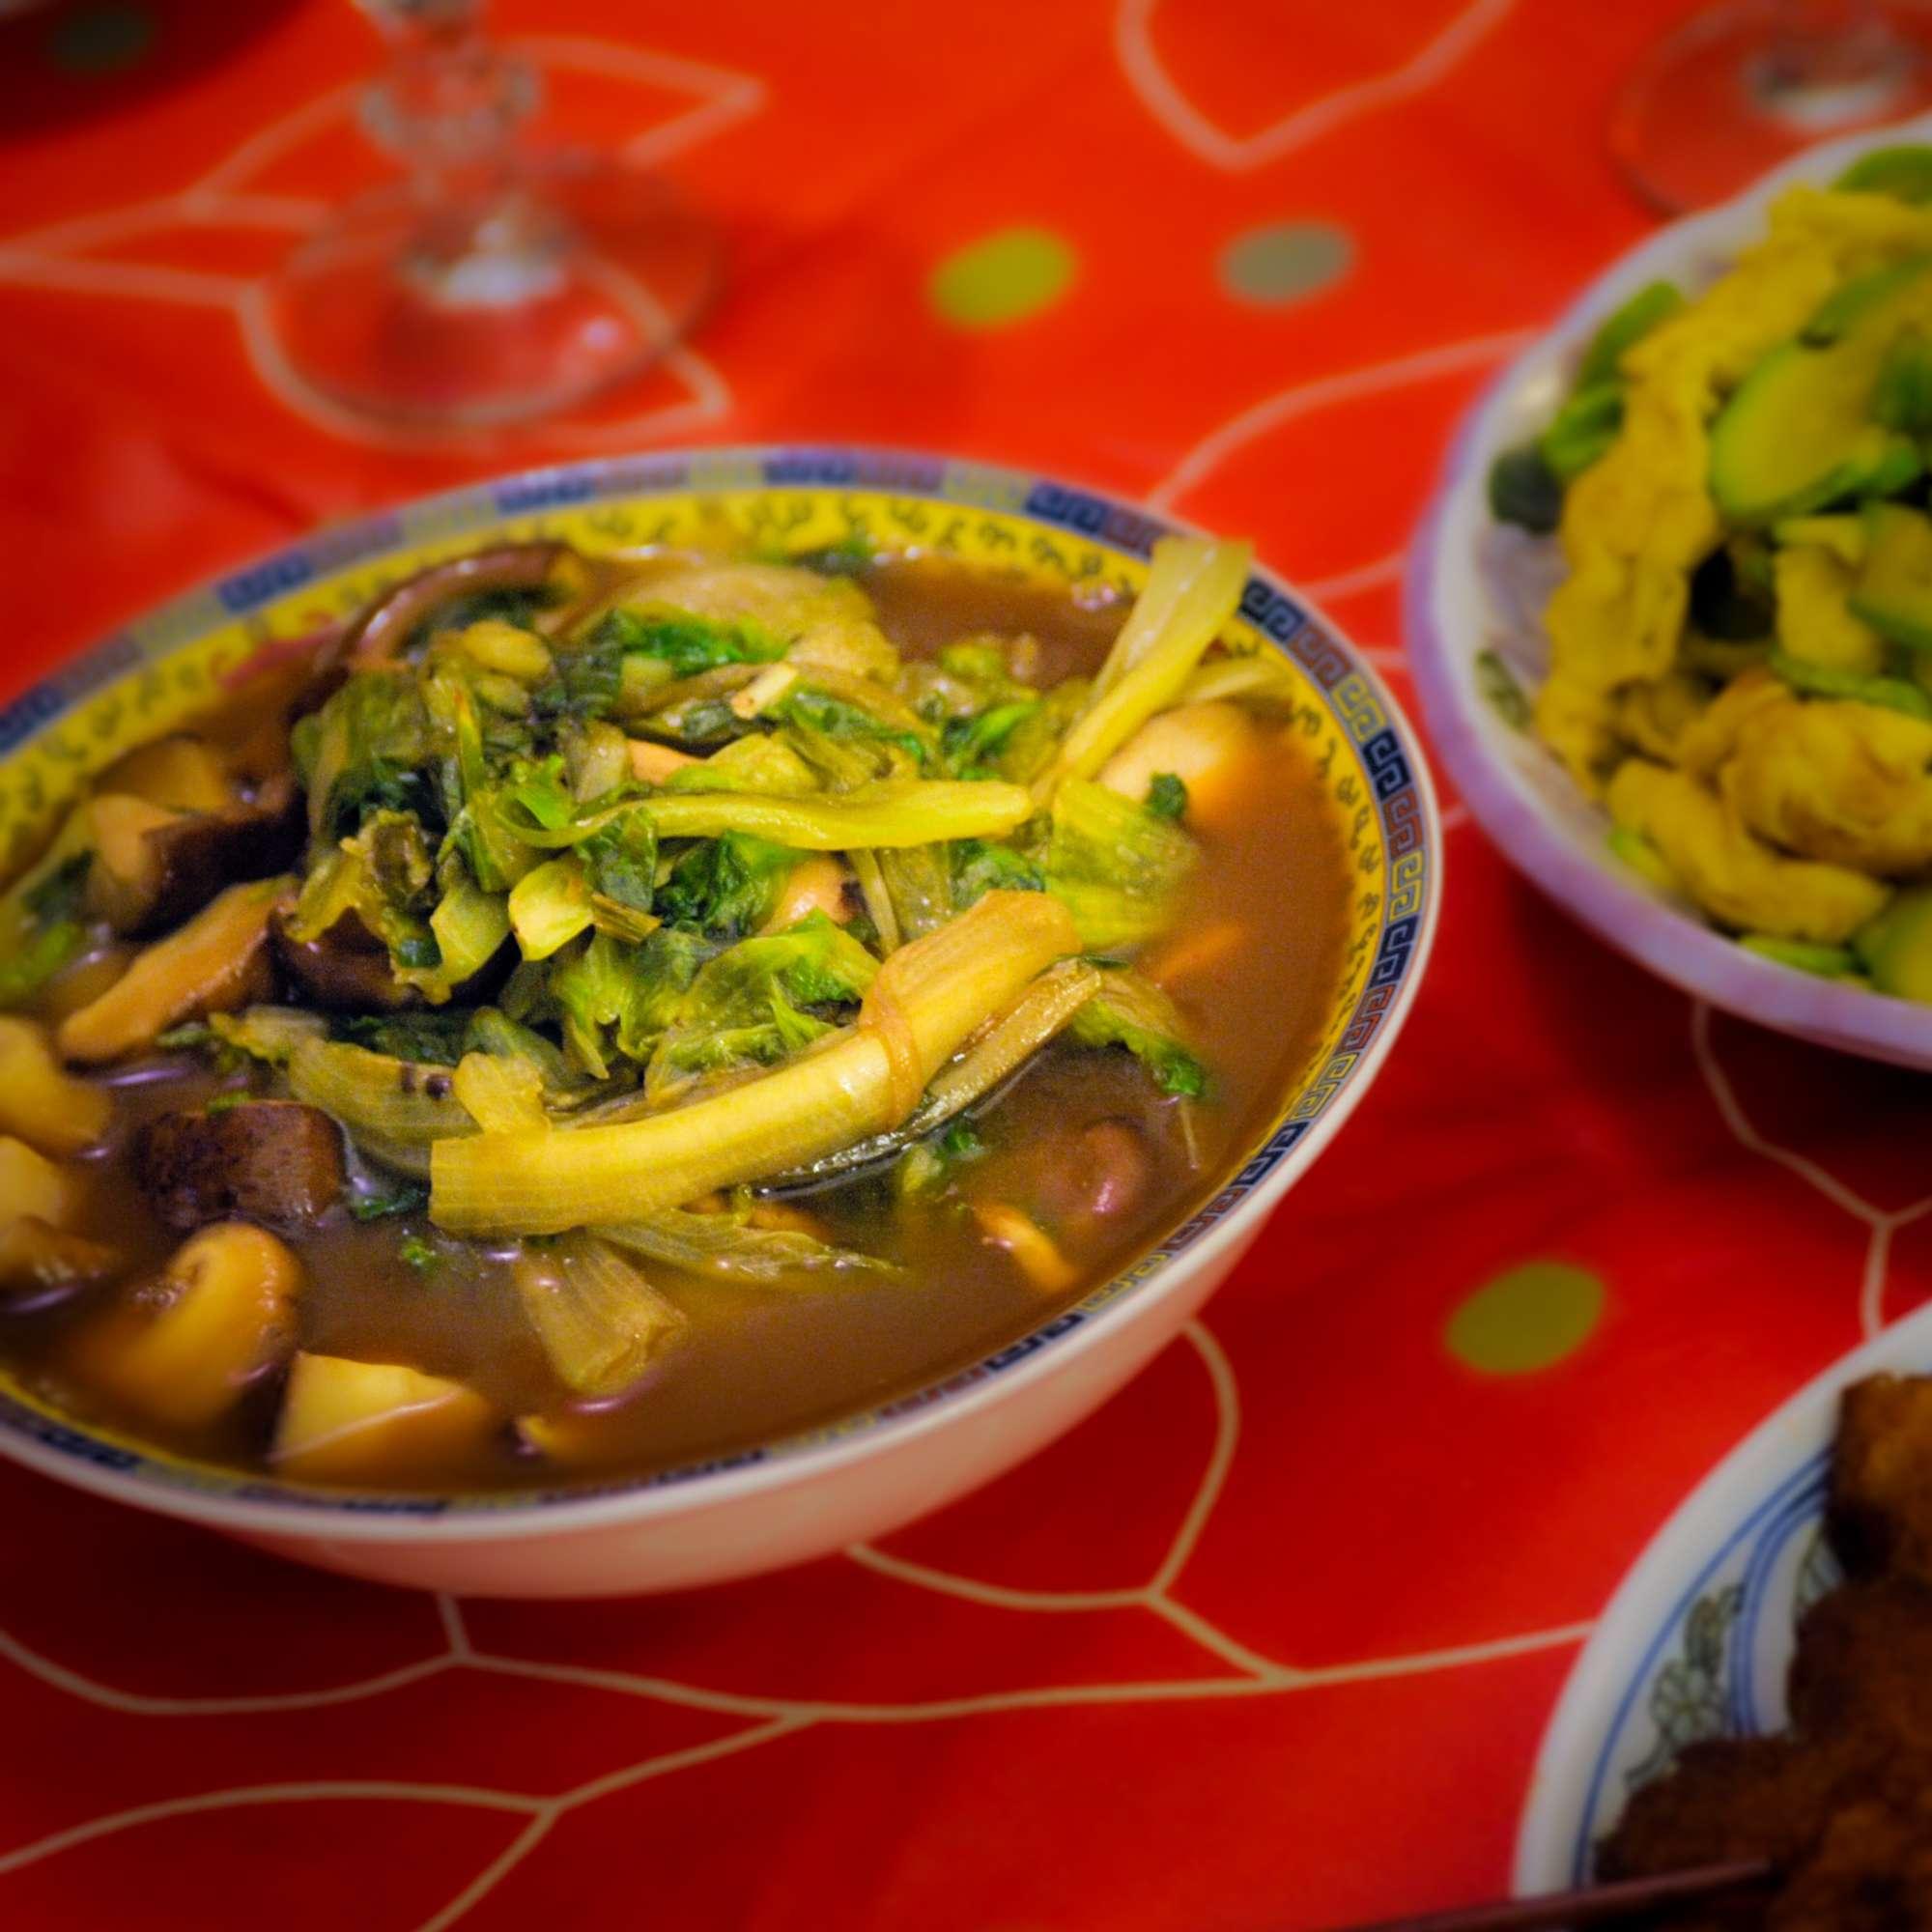 Xihuluchaojidan – Zucchini mit Ei